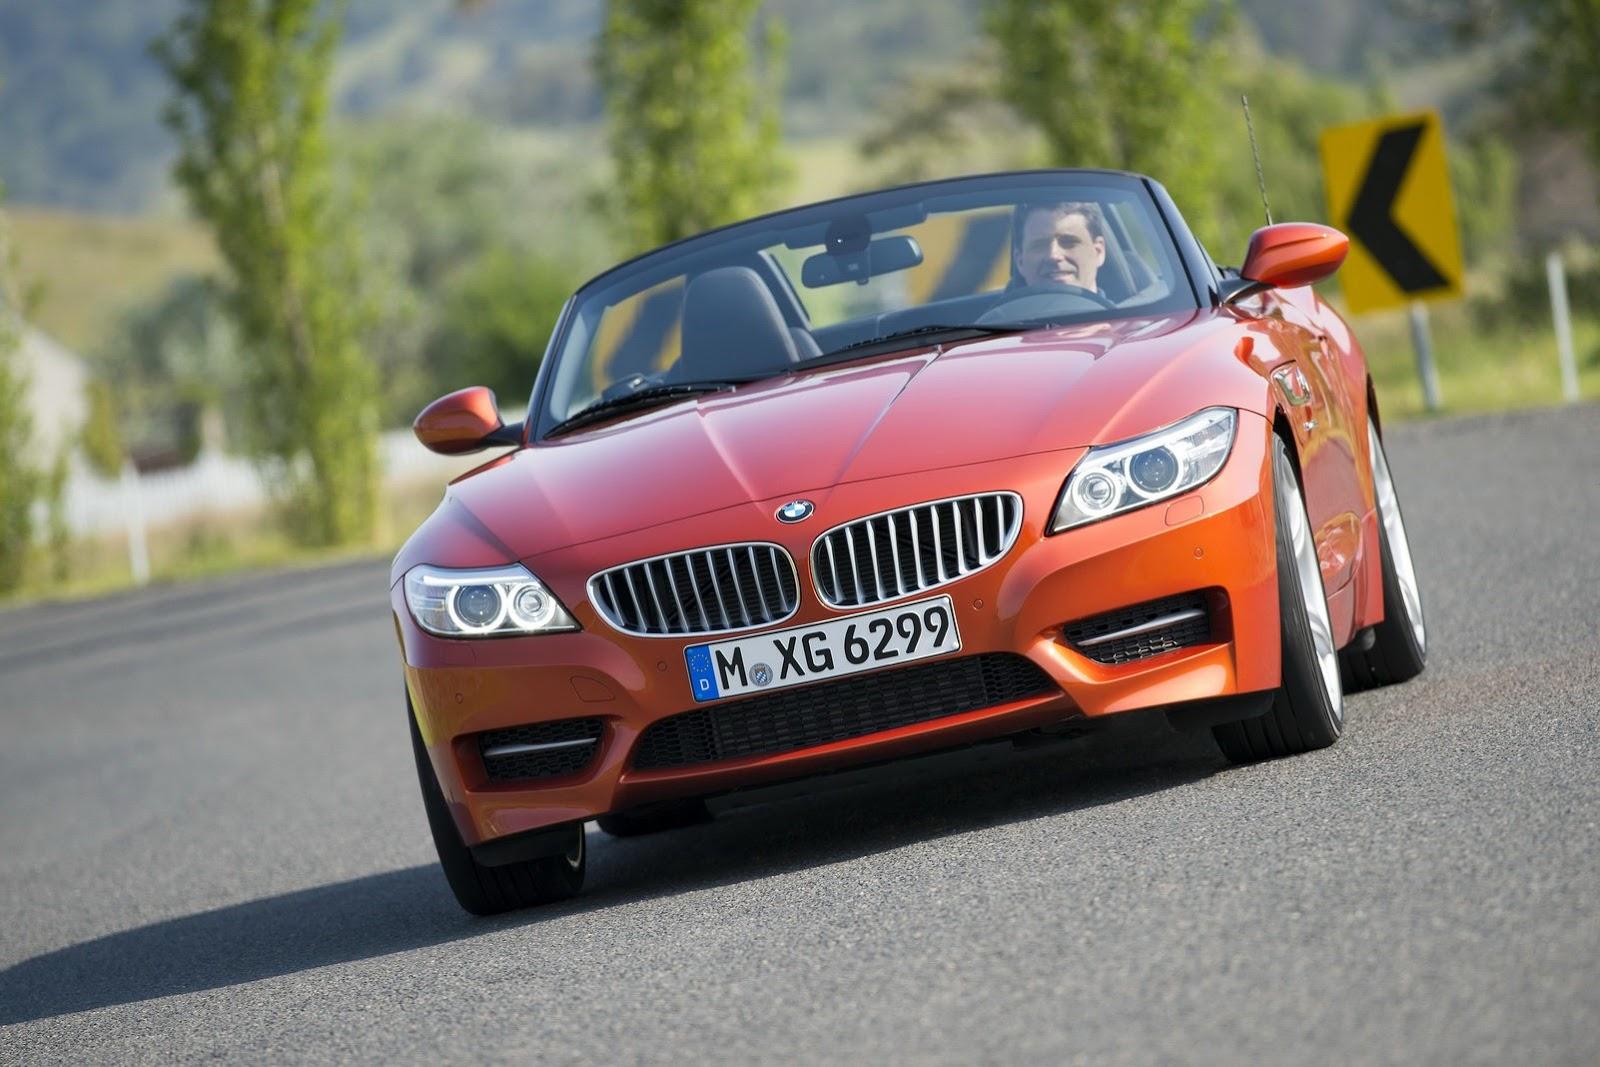 E89 BMW Z4 facelift